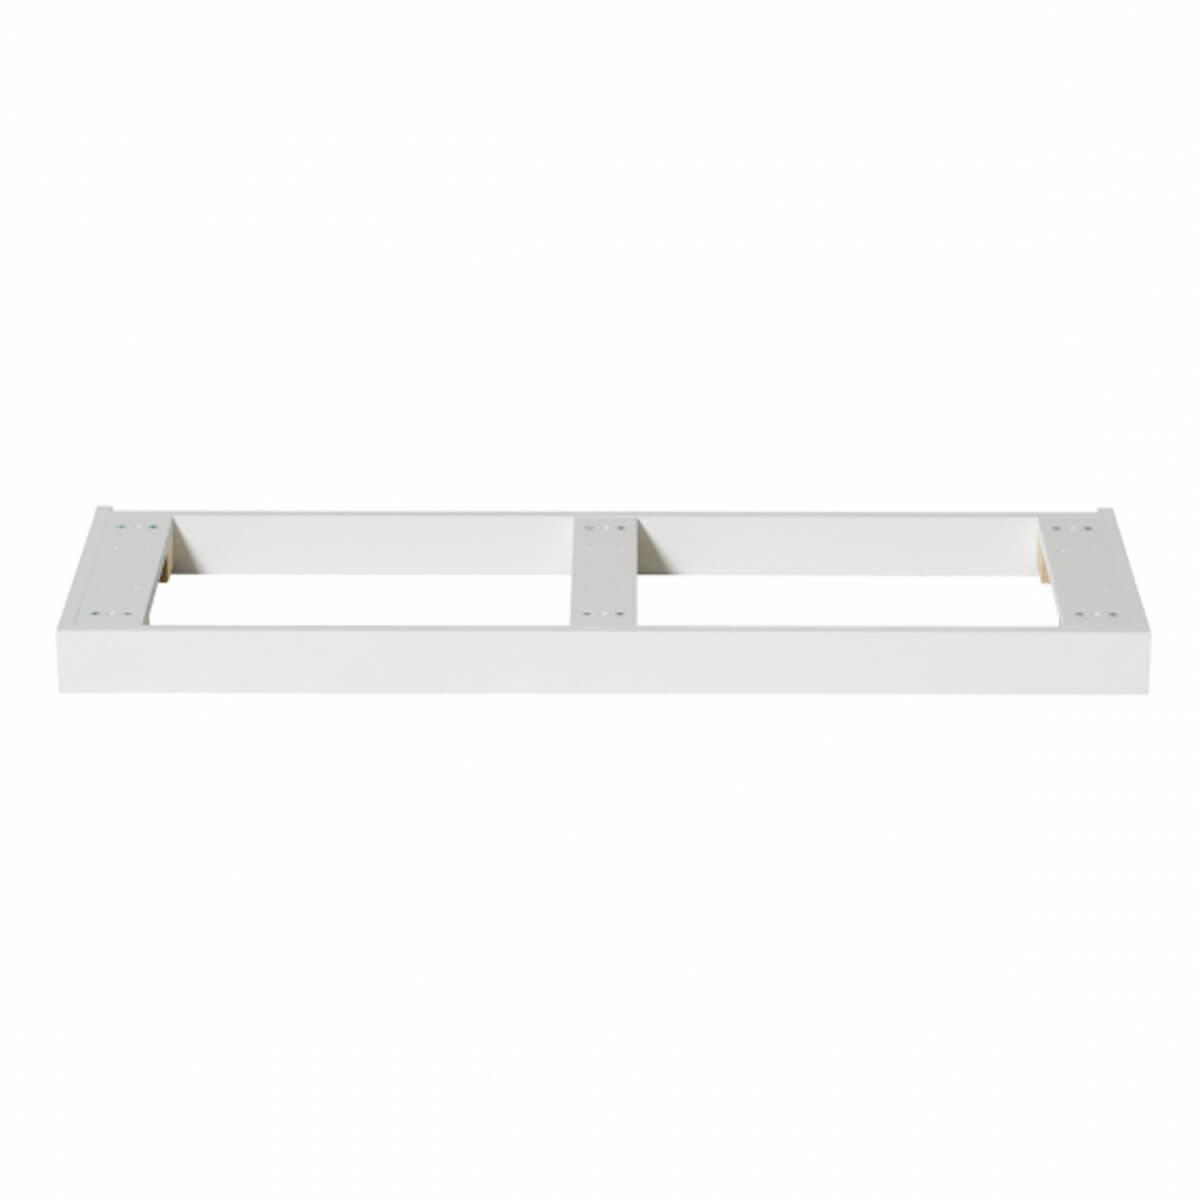 Meuble-banquette 106x78cm WOOD Oliver Furniture blanc